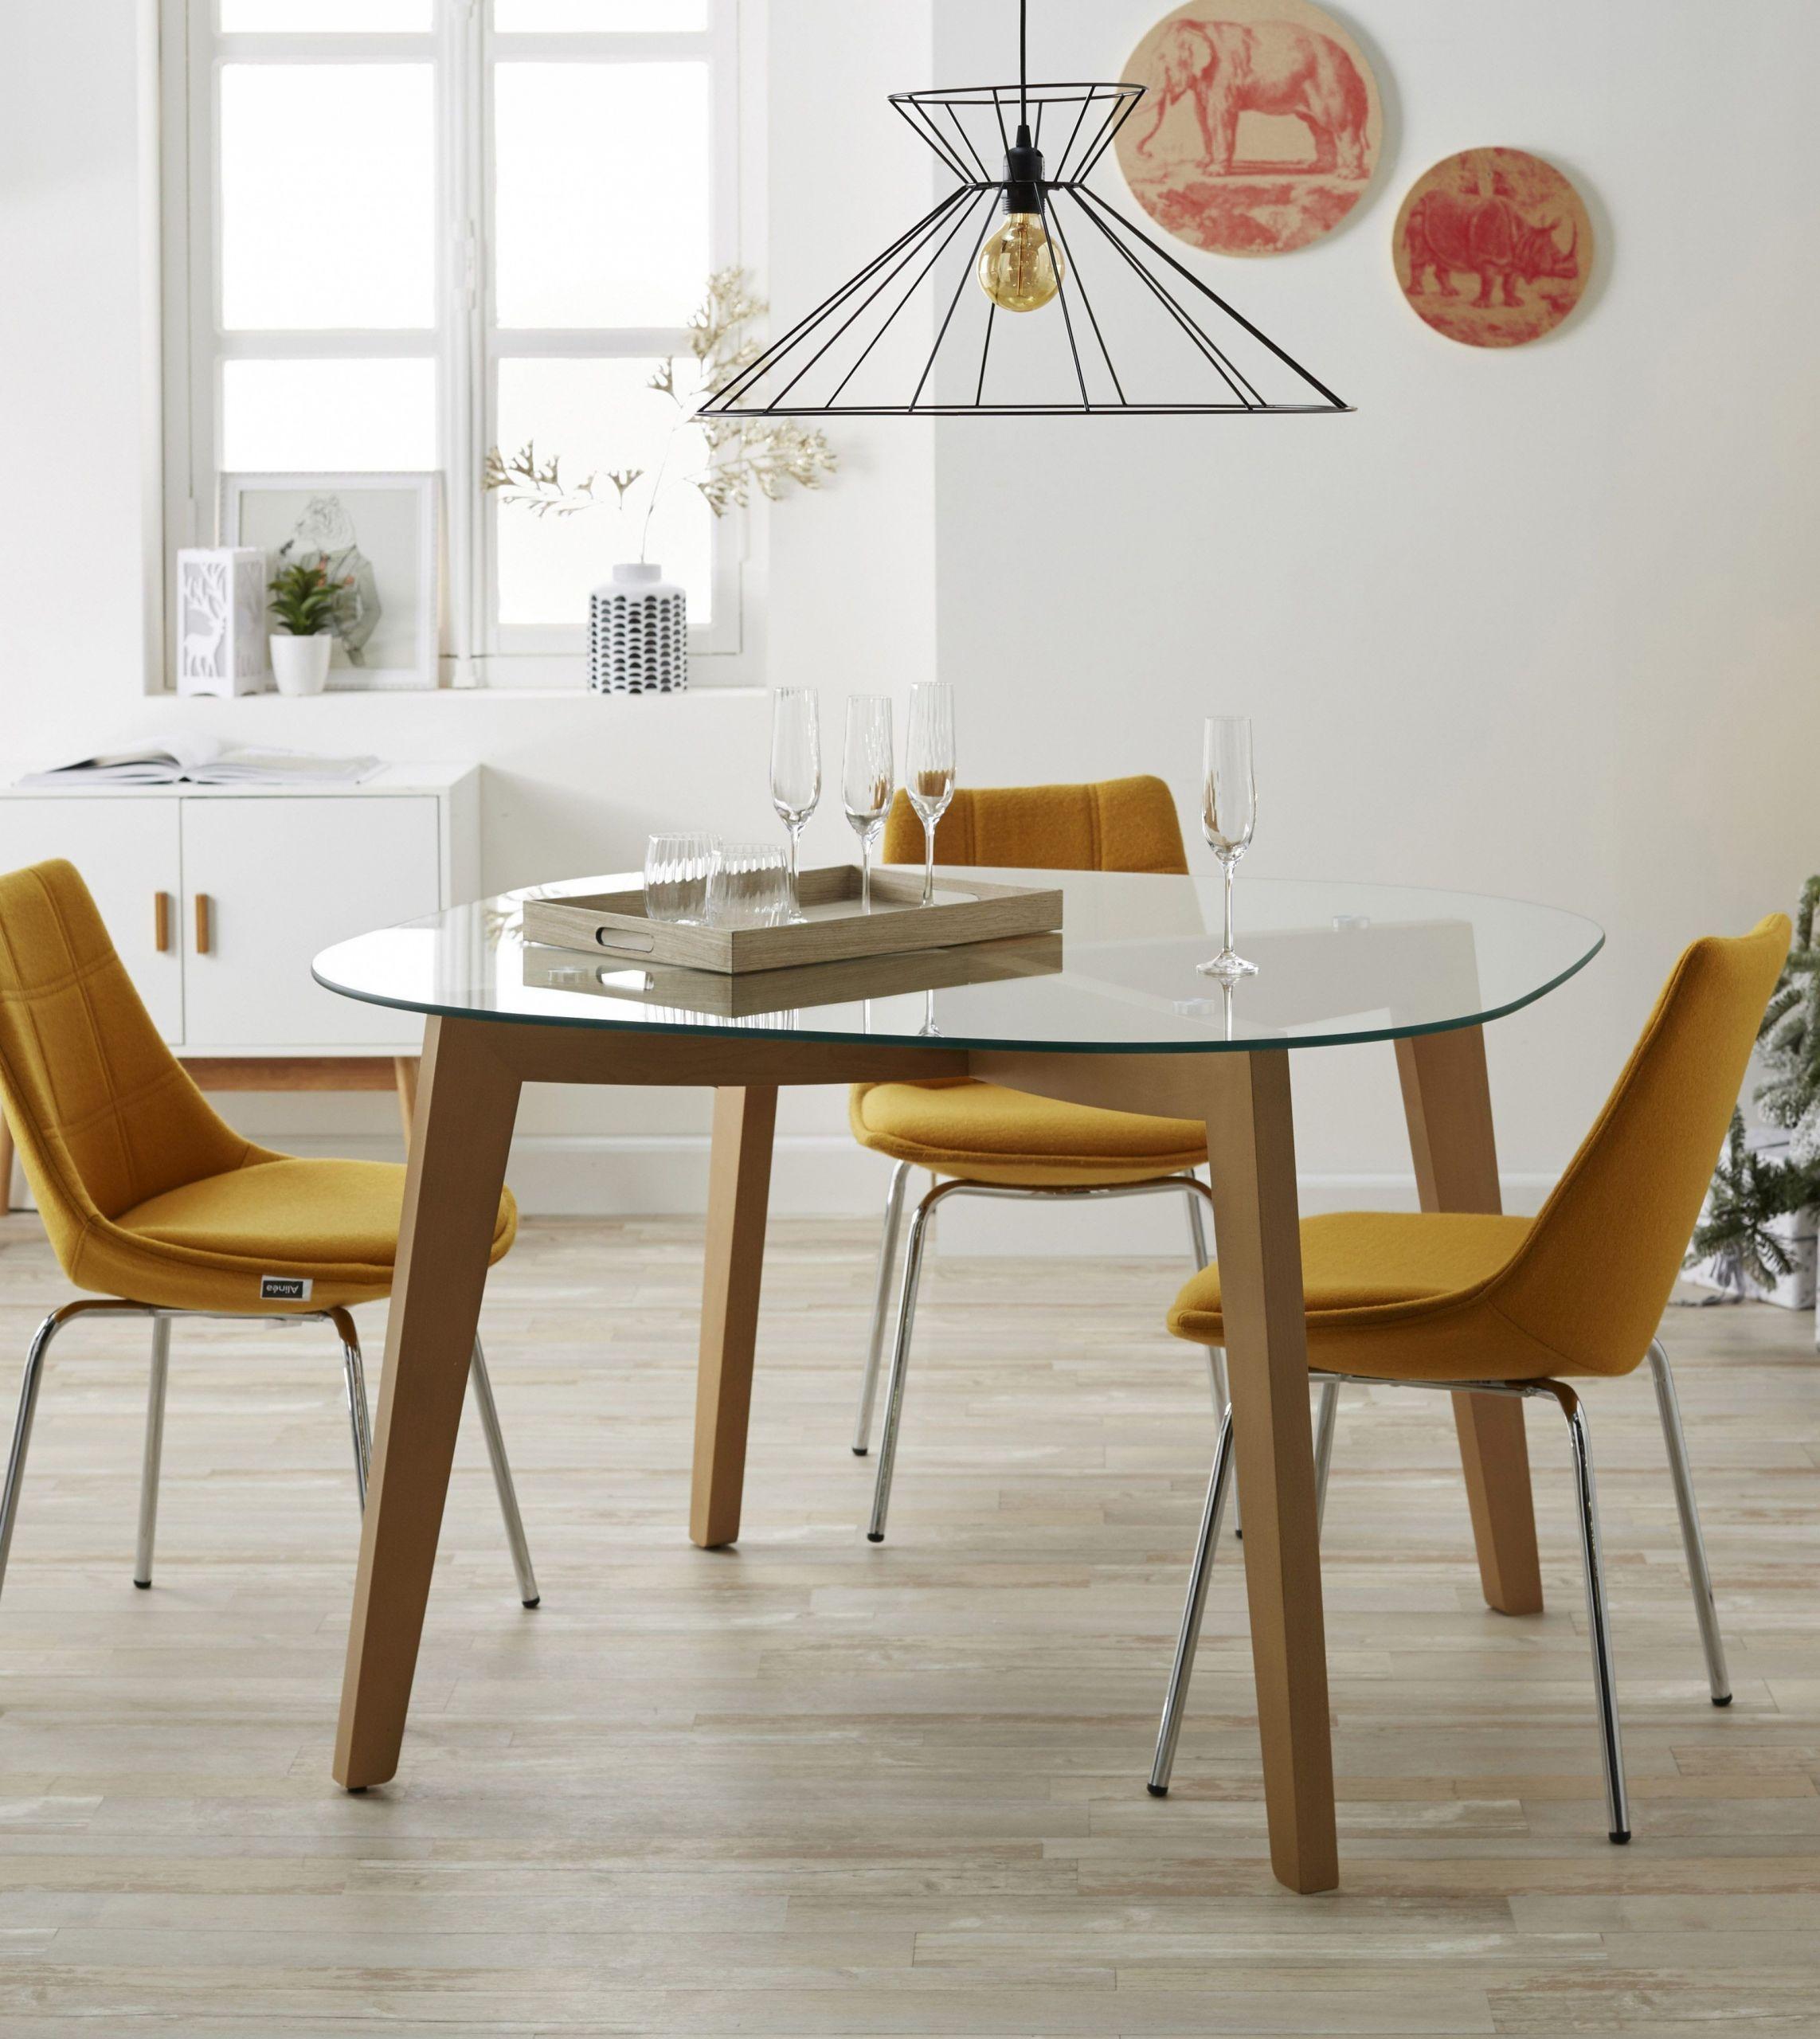 conforama table a manger lesmeubles conforama chaises salle a manger conforama chaise 0d of conforama table a manger 1